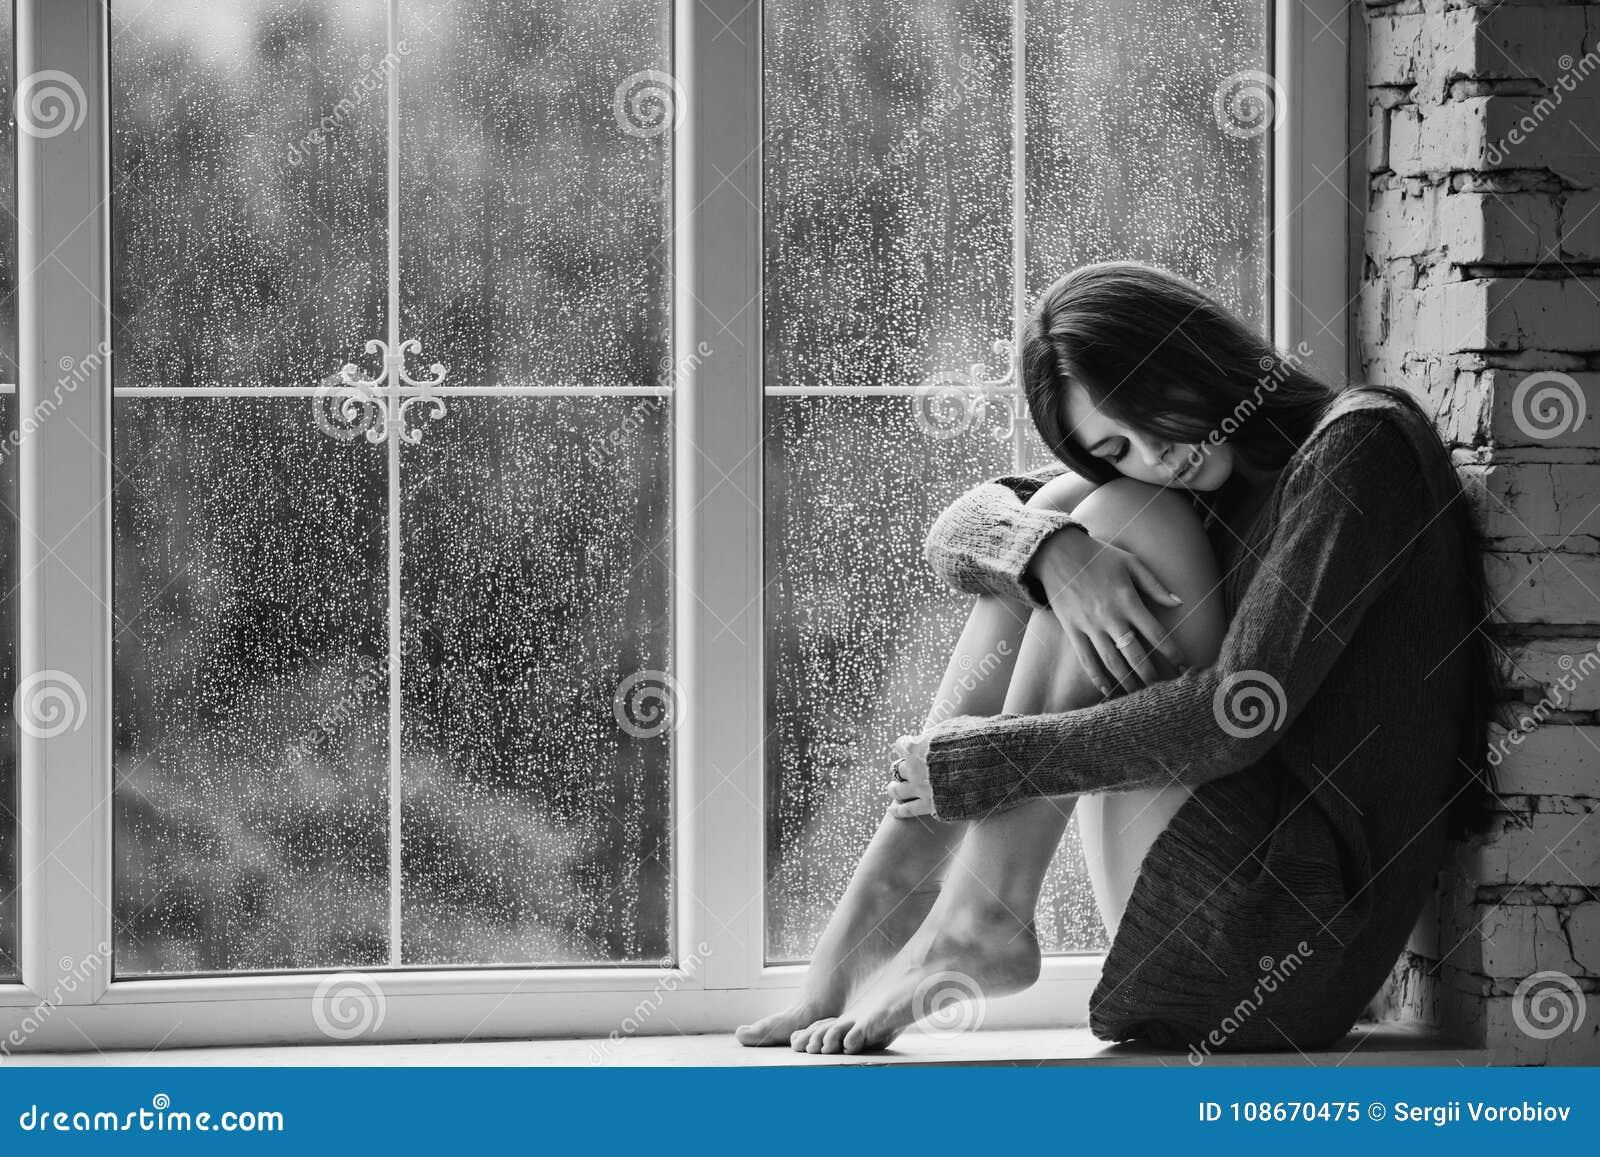 Beautiful Young Woman Sitting Alone Near Window With Rain ...